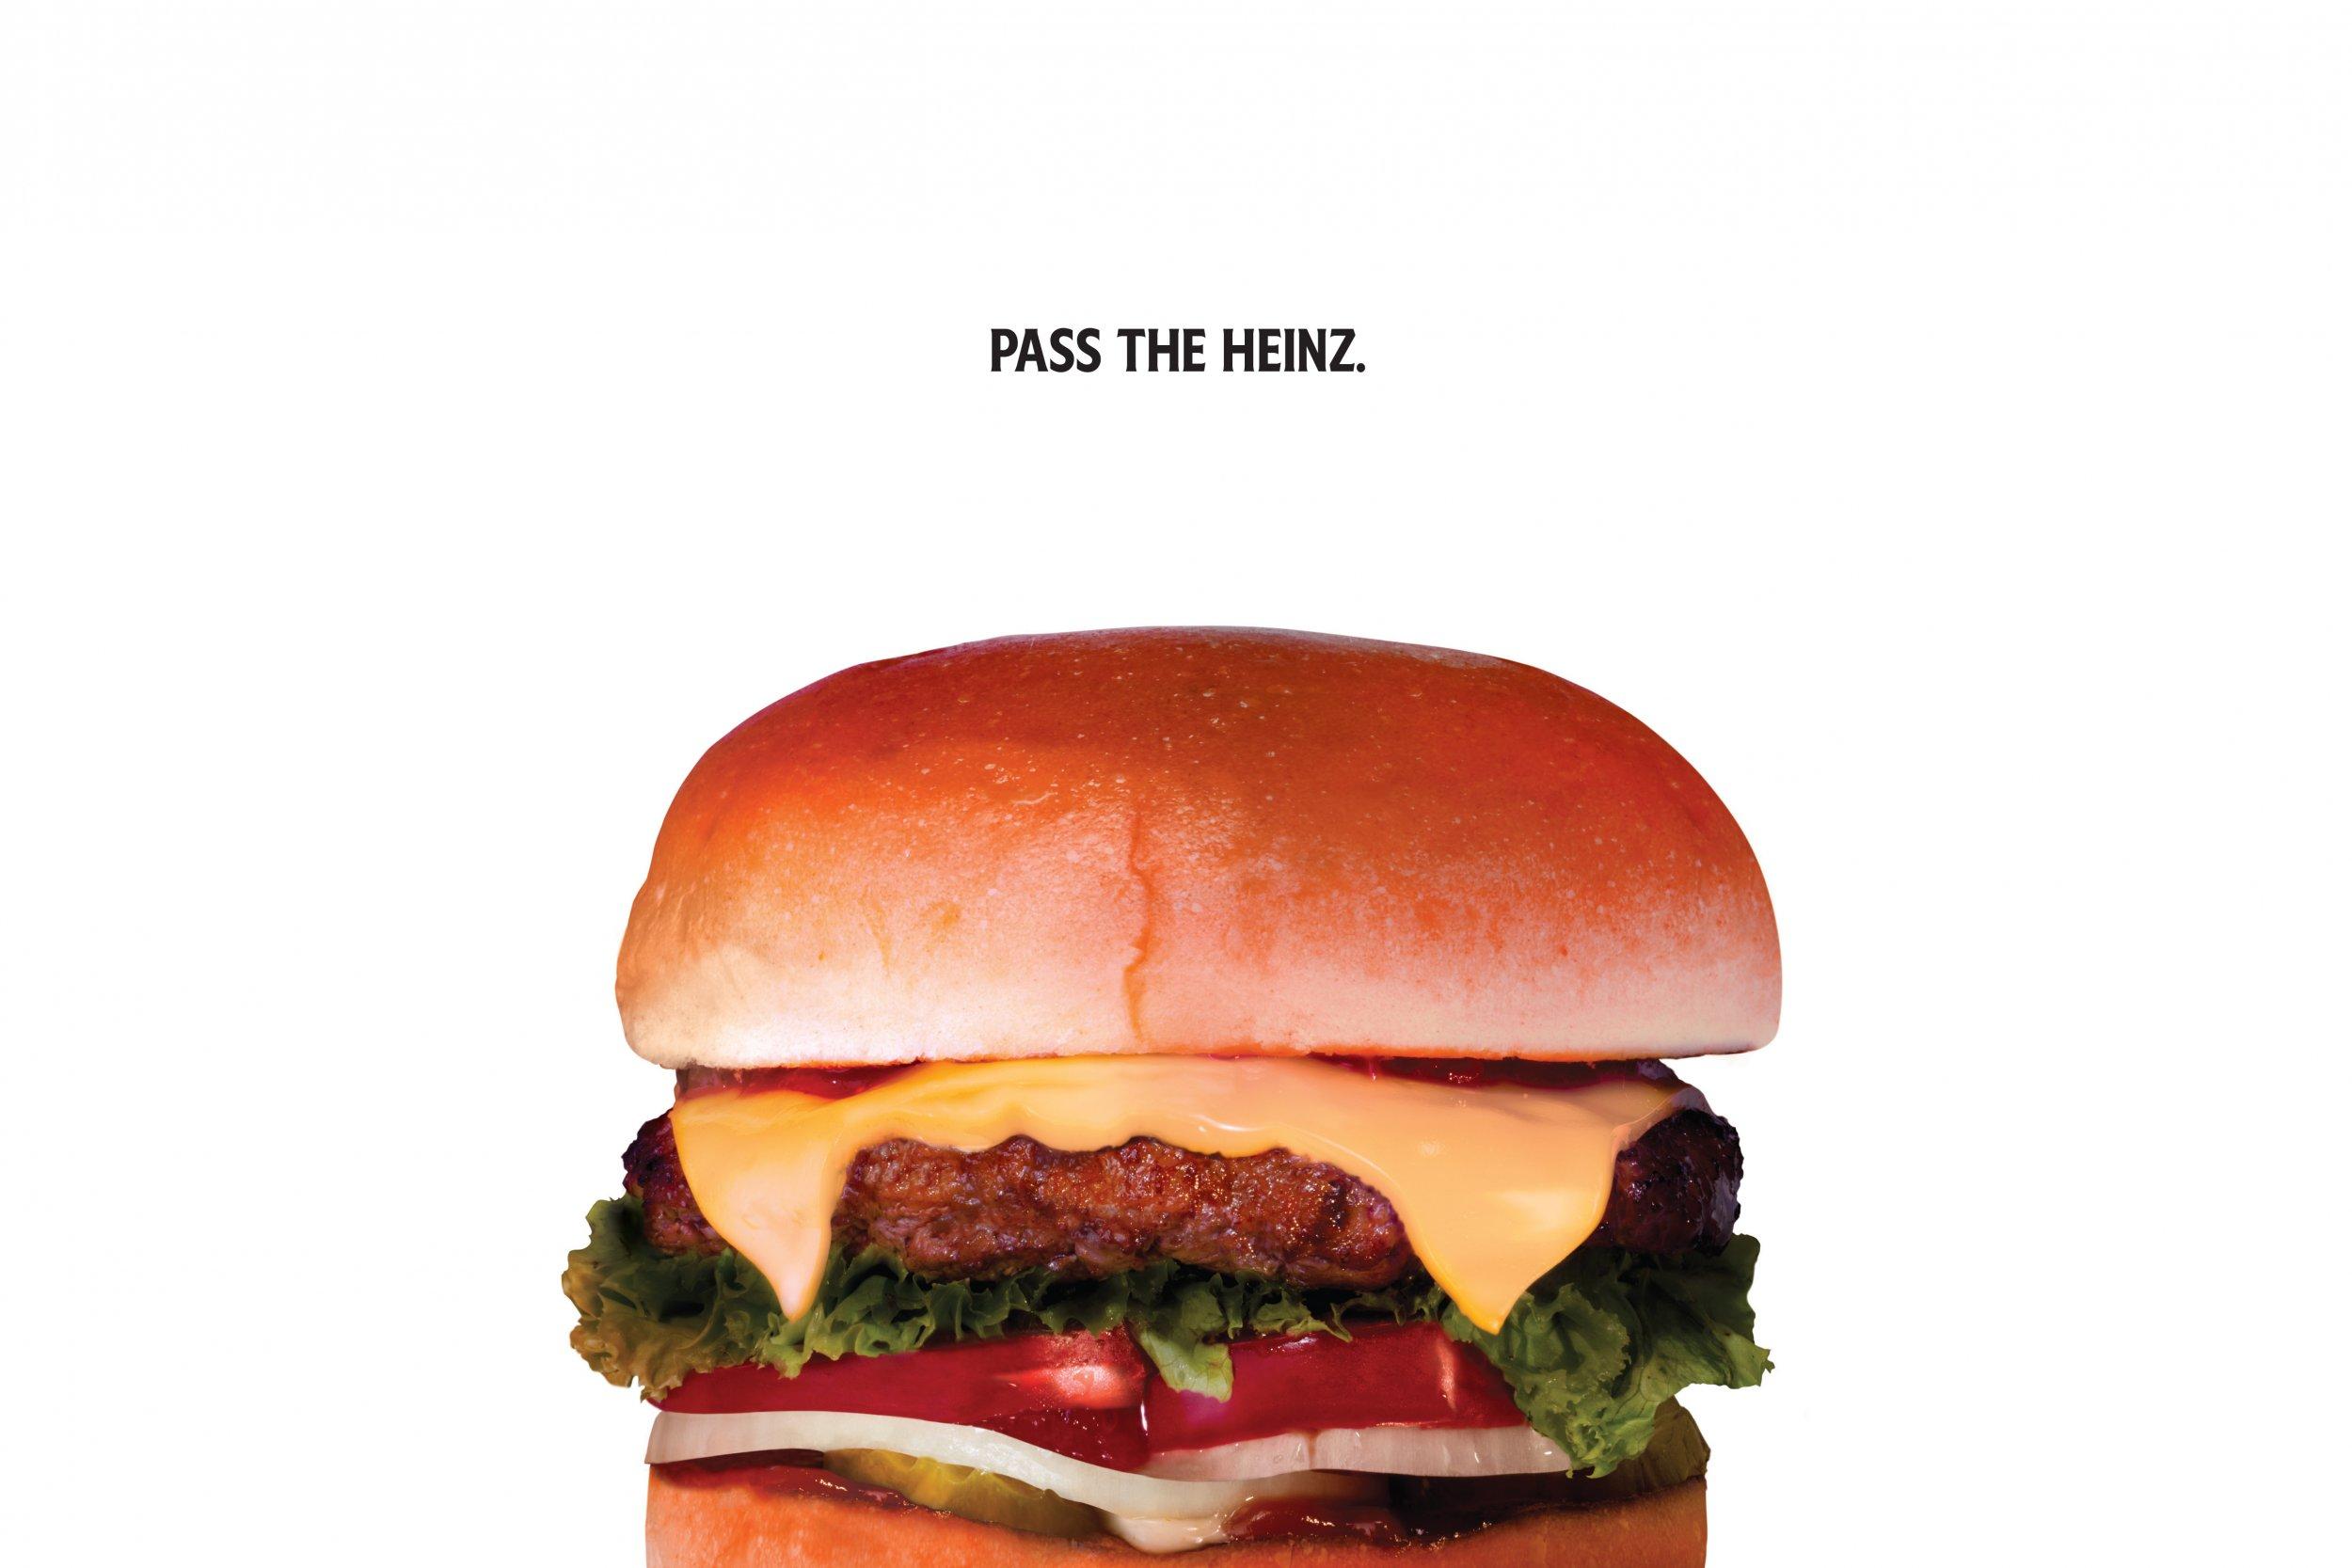 Heinz_MadMen_Burger